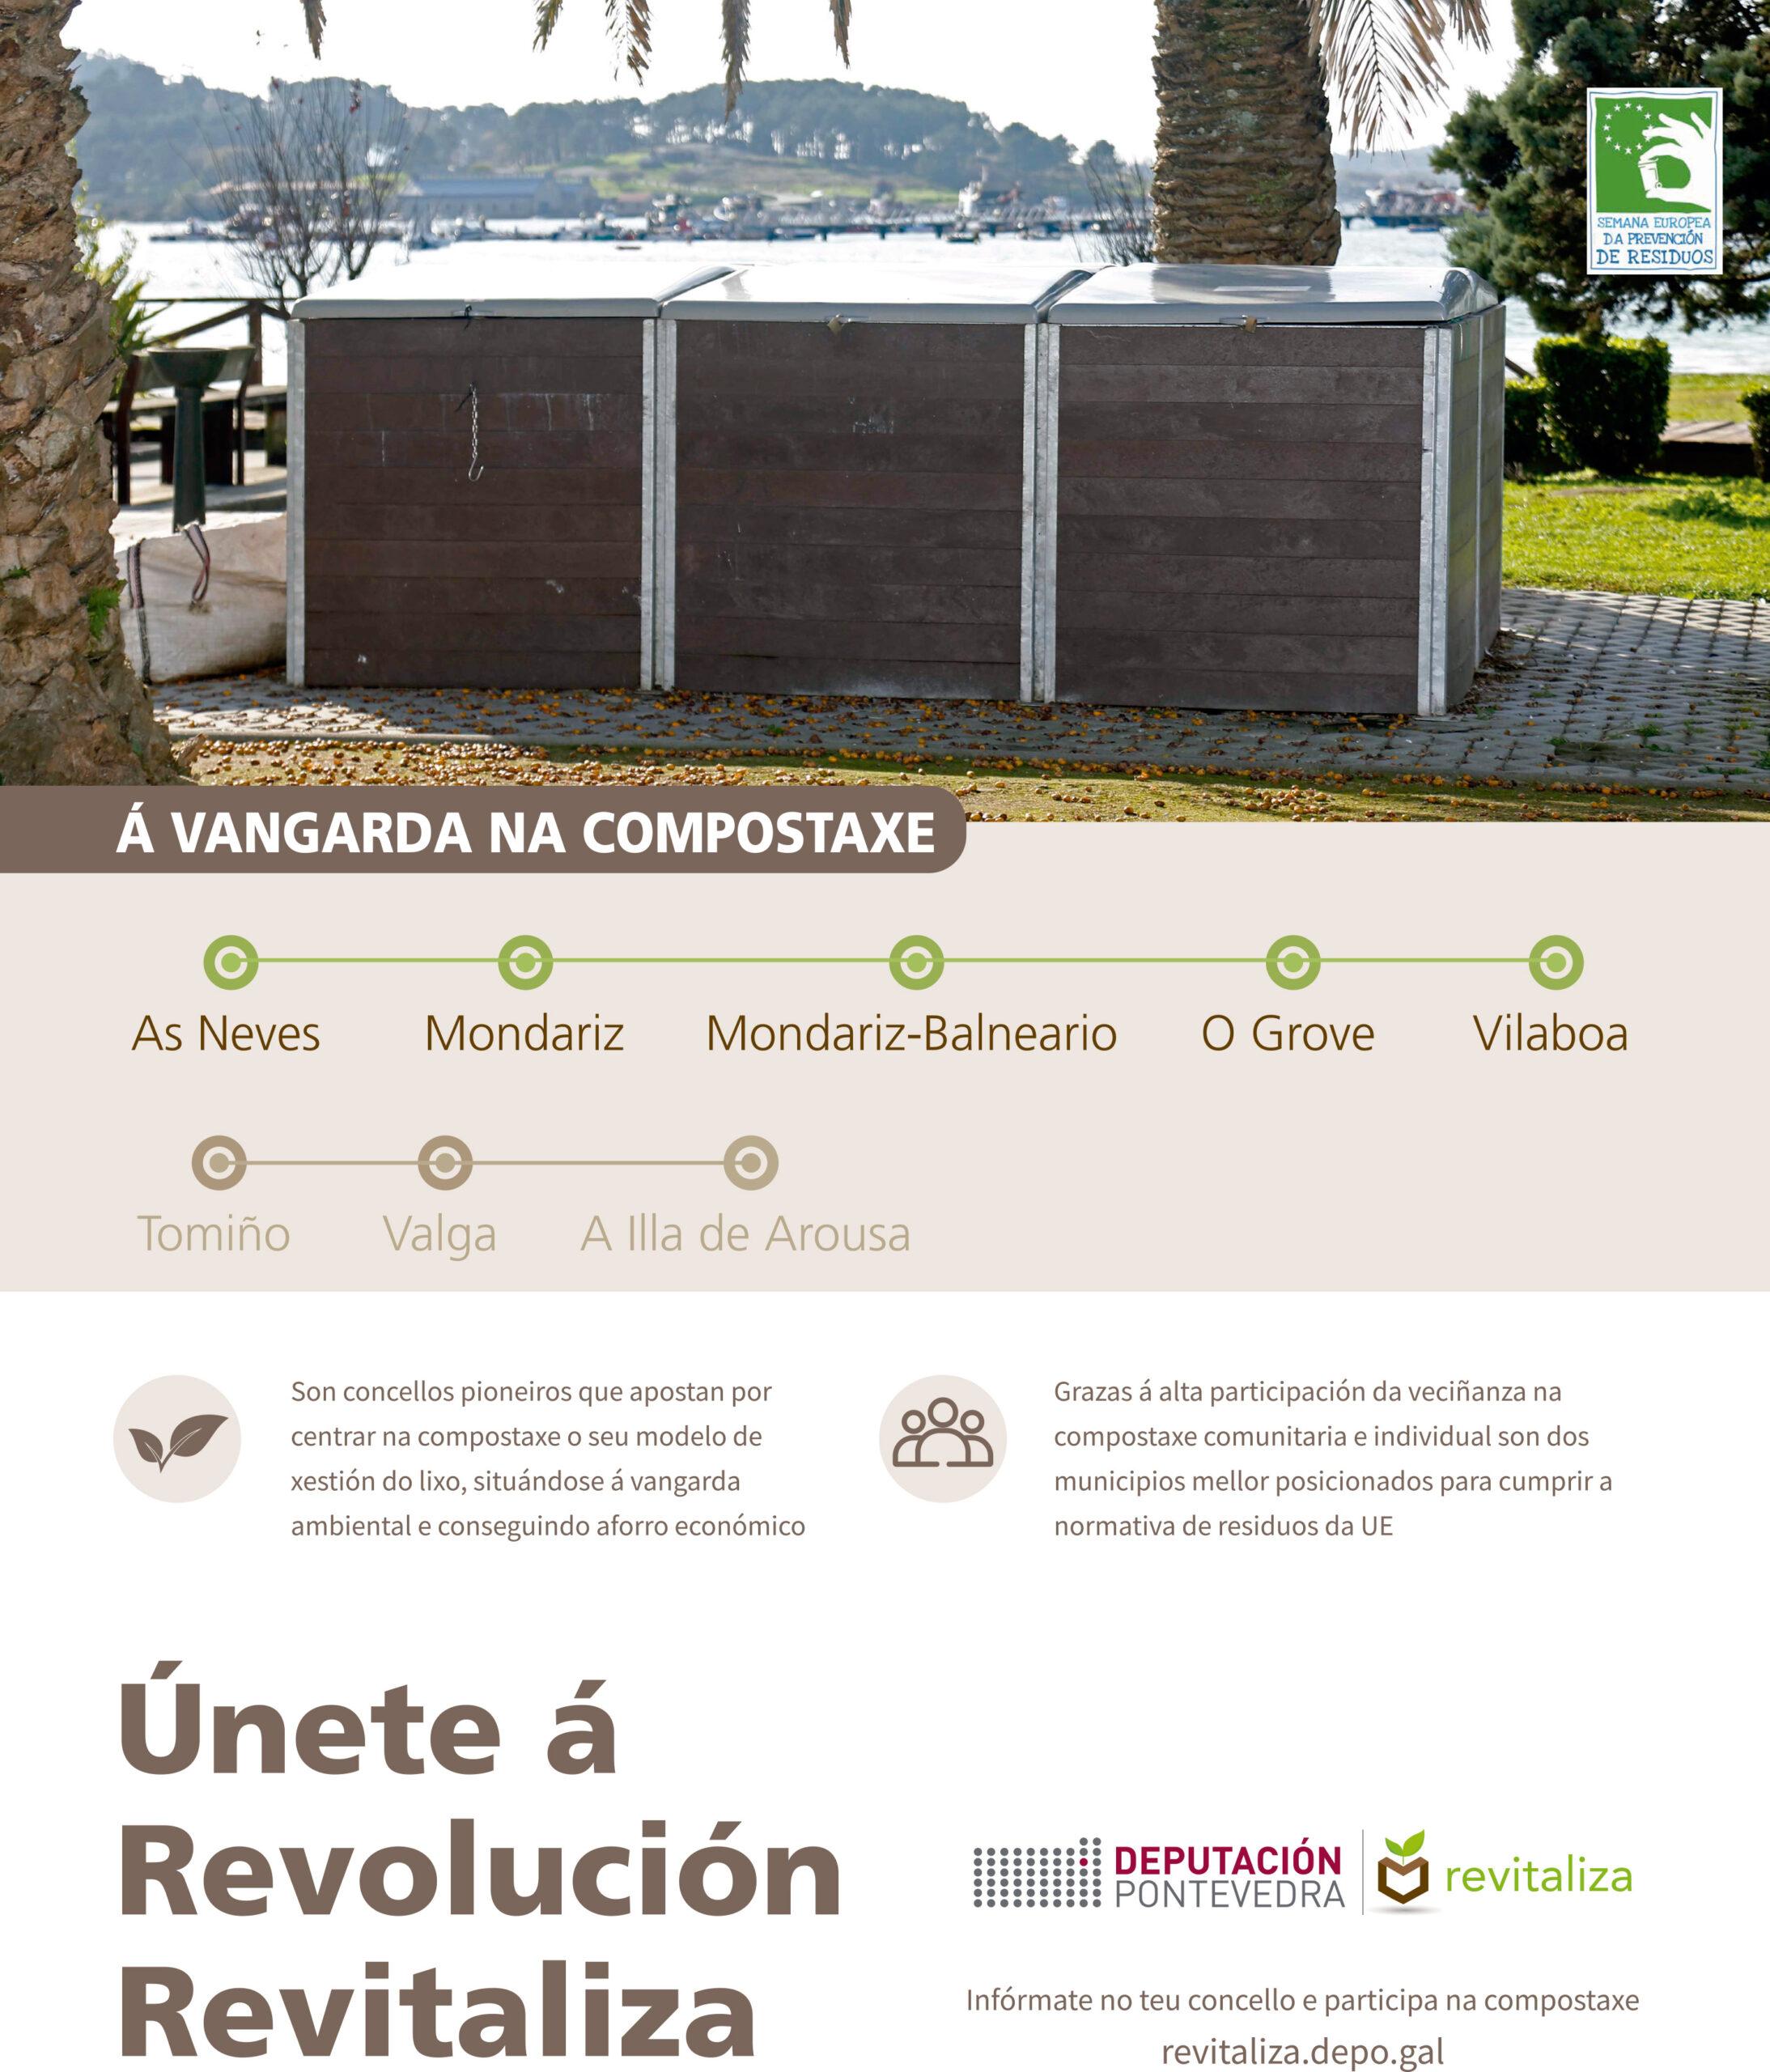 Revitaliza Nós Deputación de Pontevedra